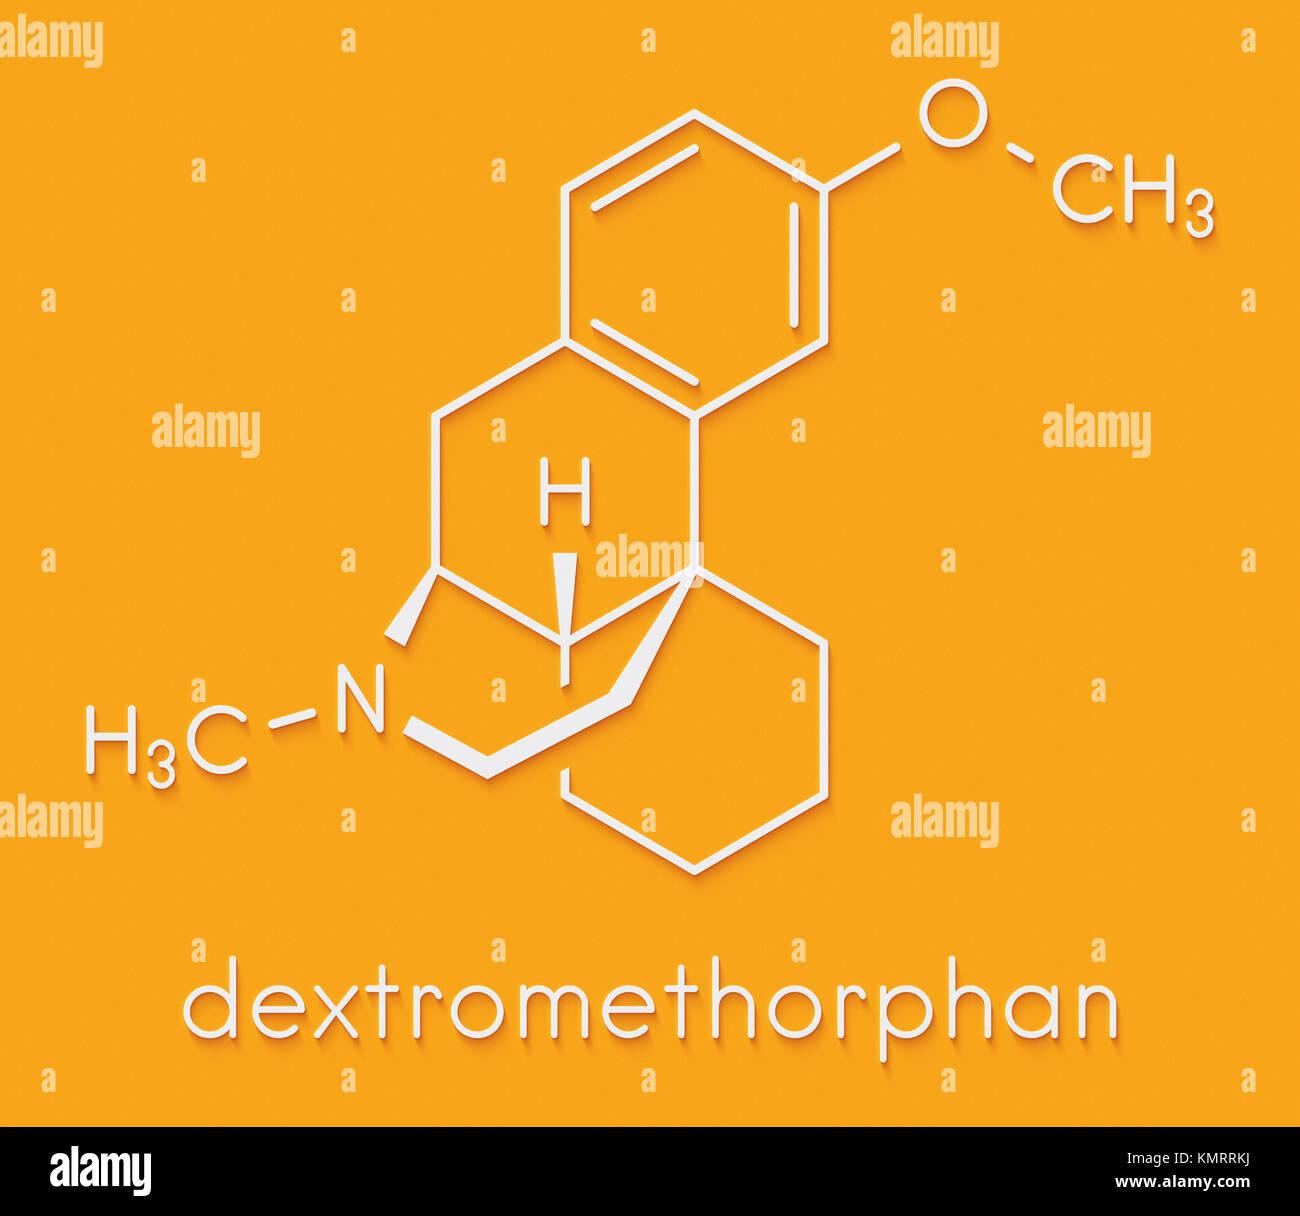 Dextromethorphan cough suppressant drug (antitussive) molecule. Skeletal formula. - Stock Image